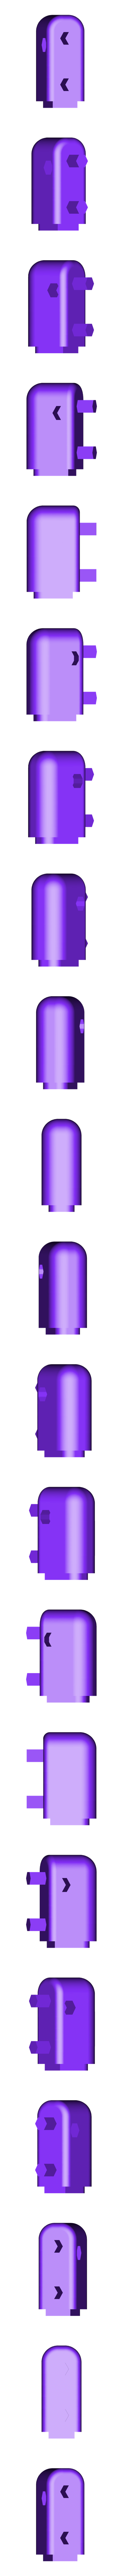 Head.stl Download free STL file Rainbow Toucan • 3D printing template, 3rdesignworks